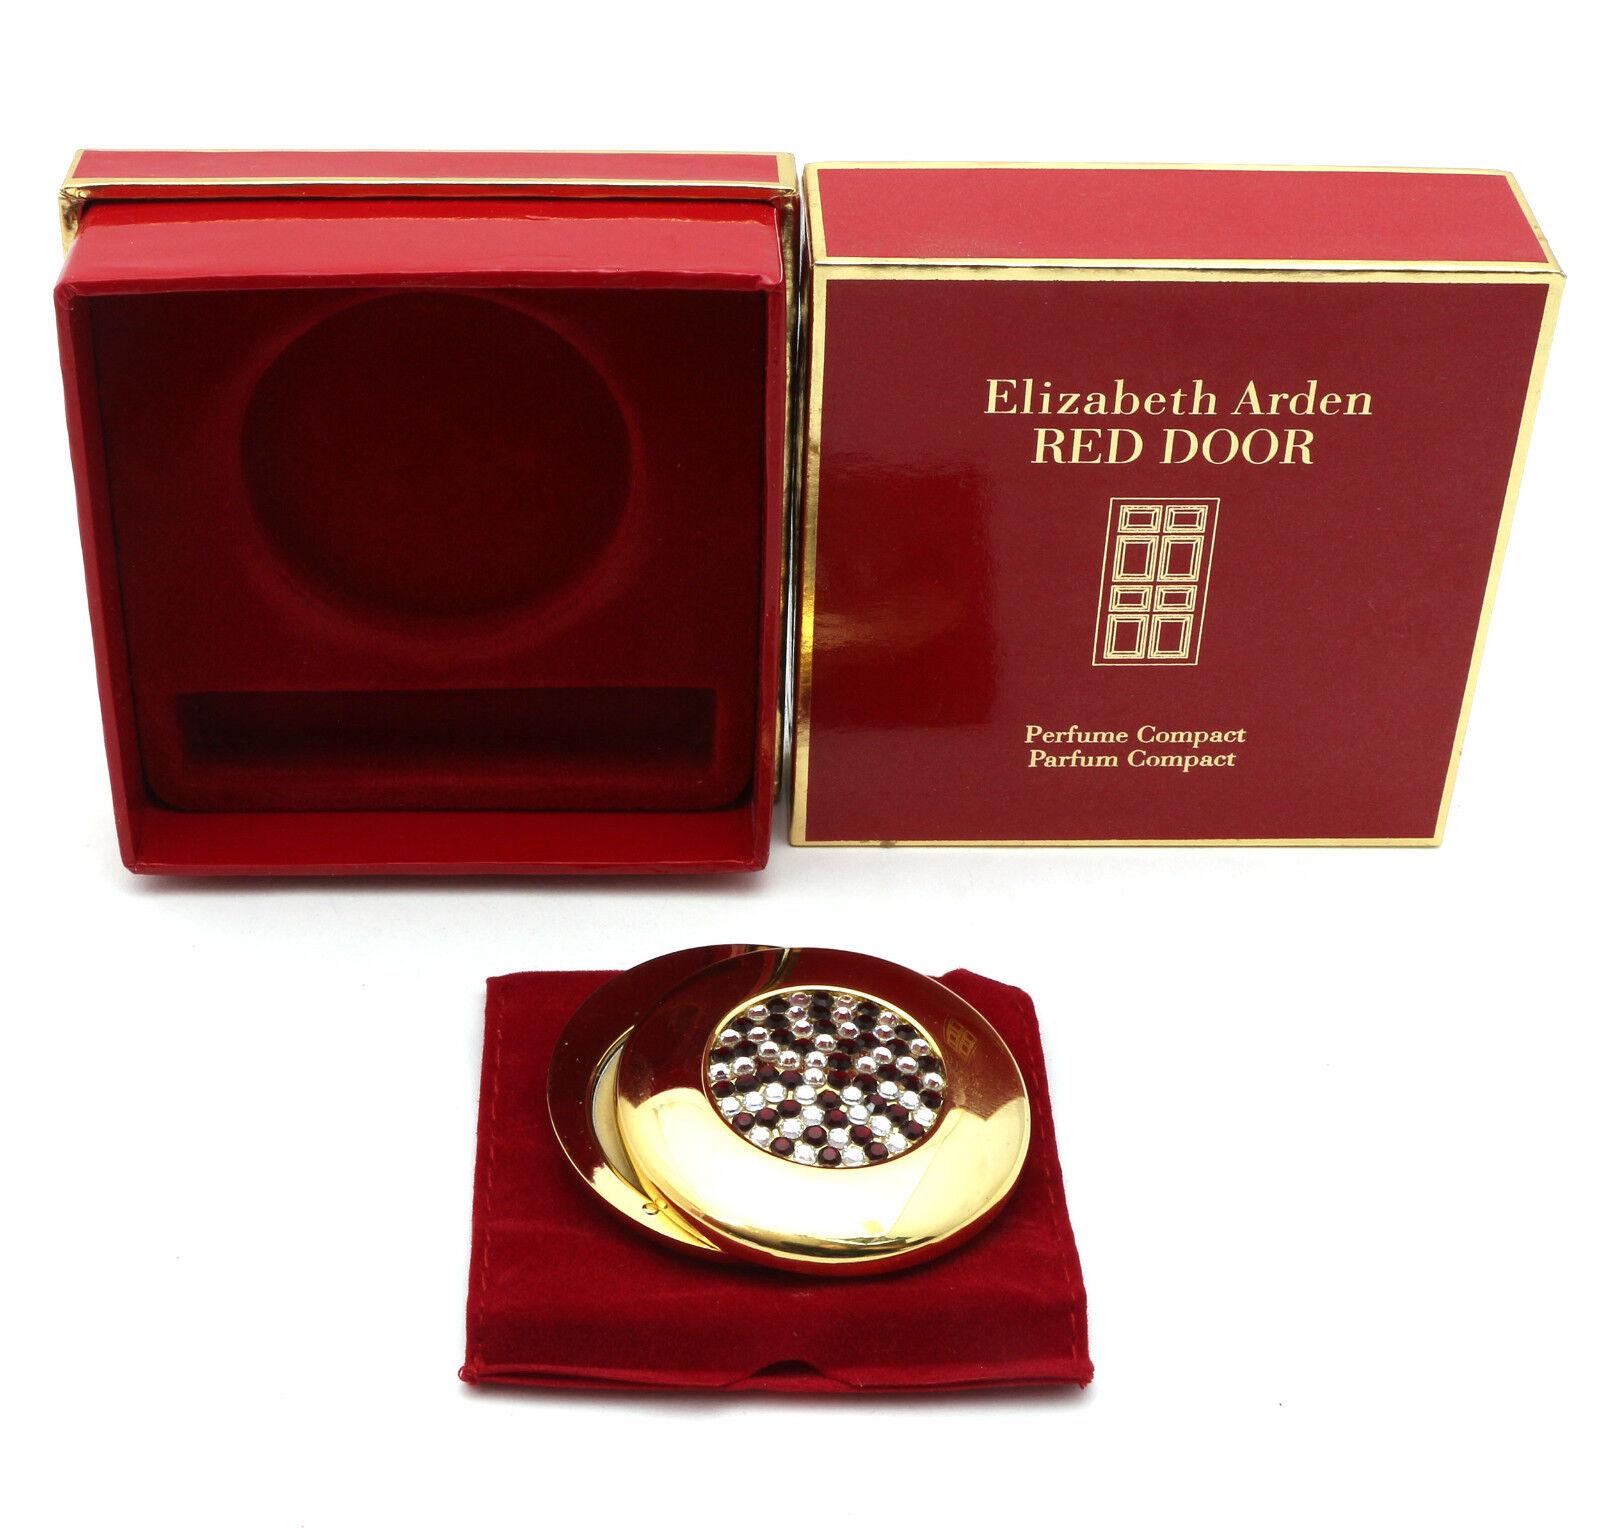 Door by Elizabeth Arden Womens Solid Perfume Perfume pact oz